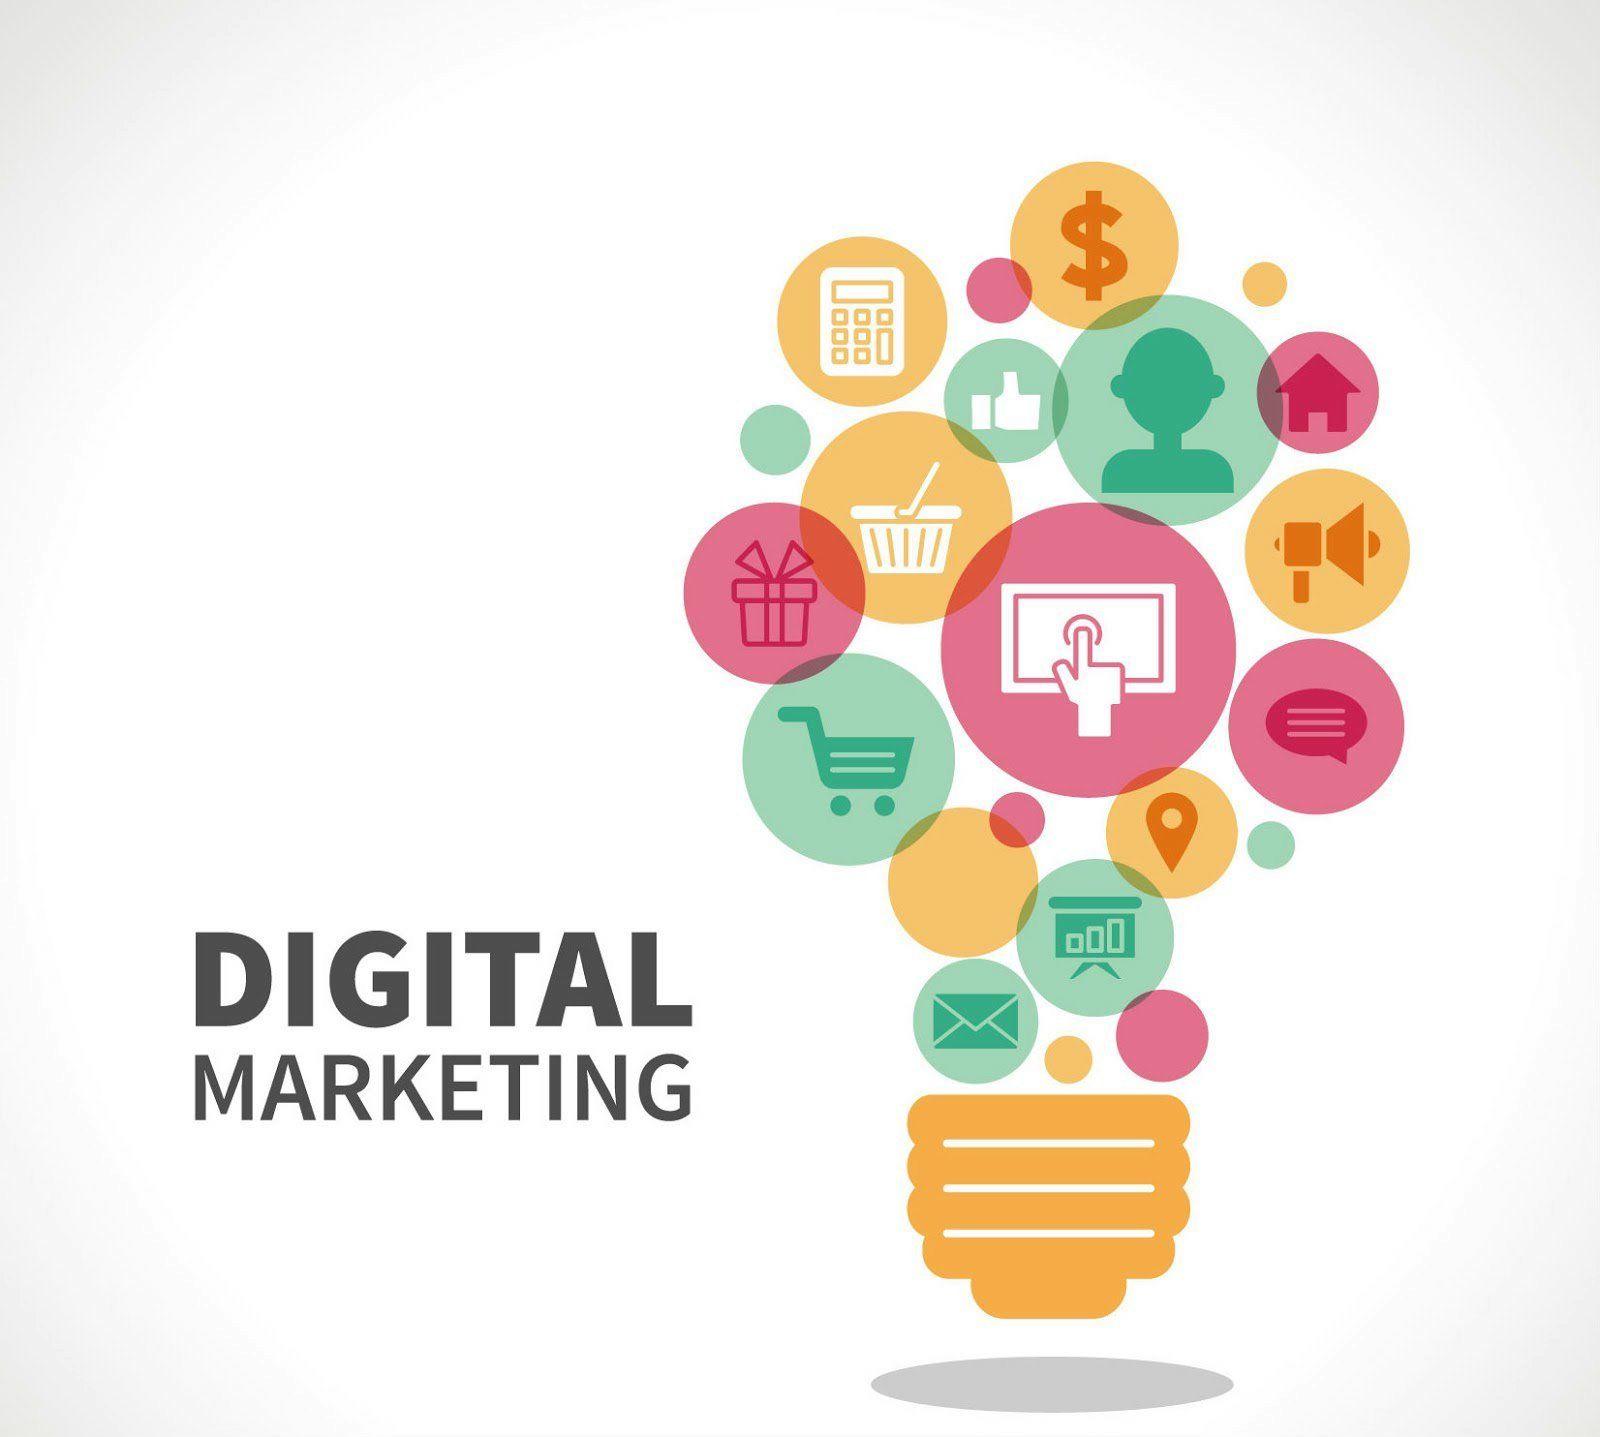 digitalmarketing-seogdk-digital-marketing